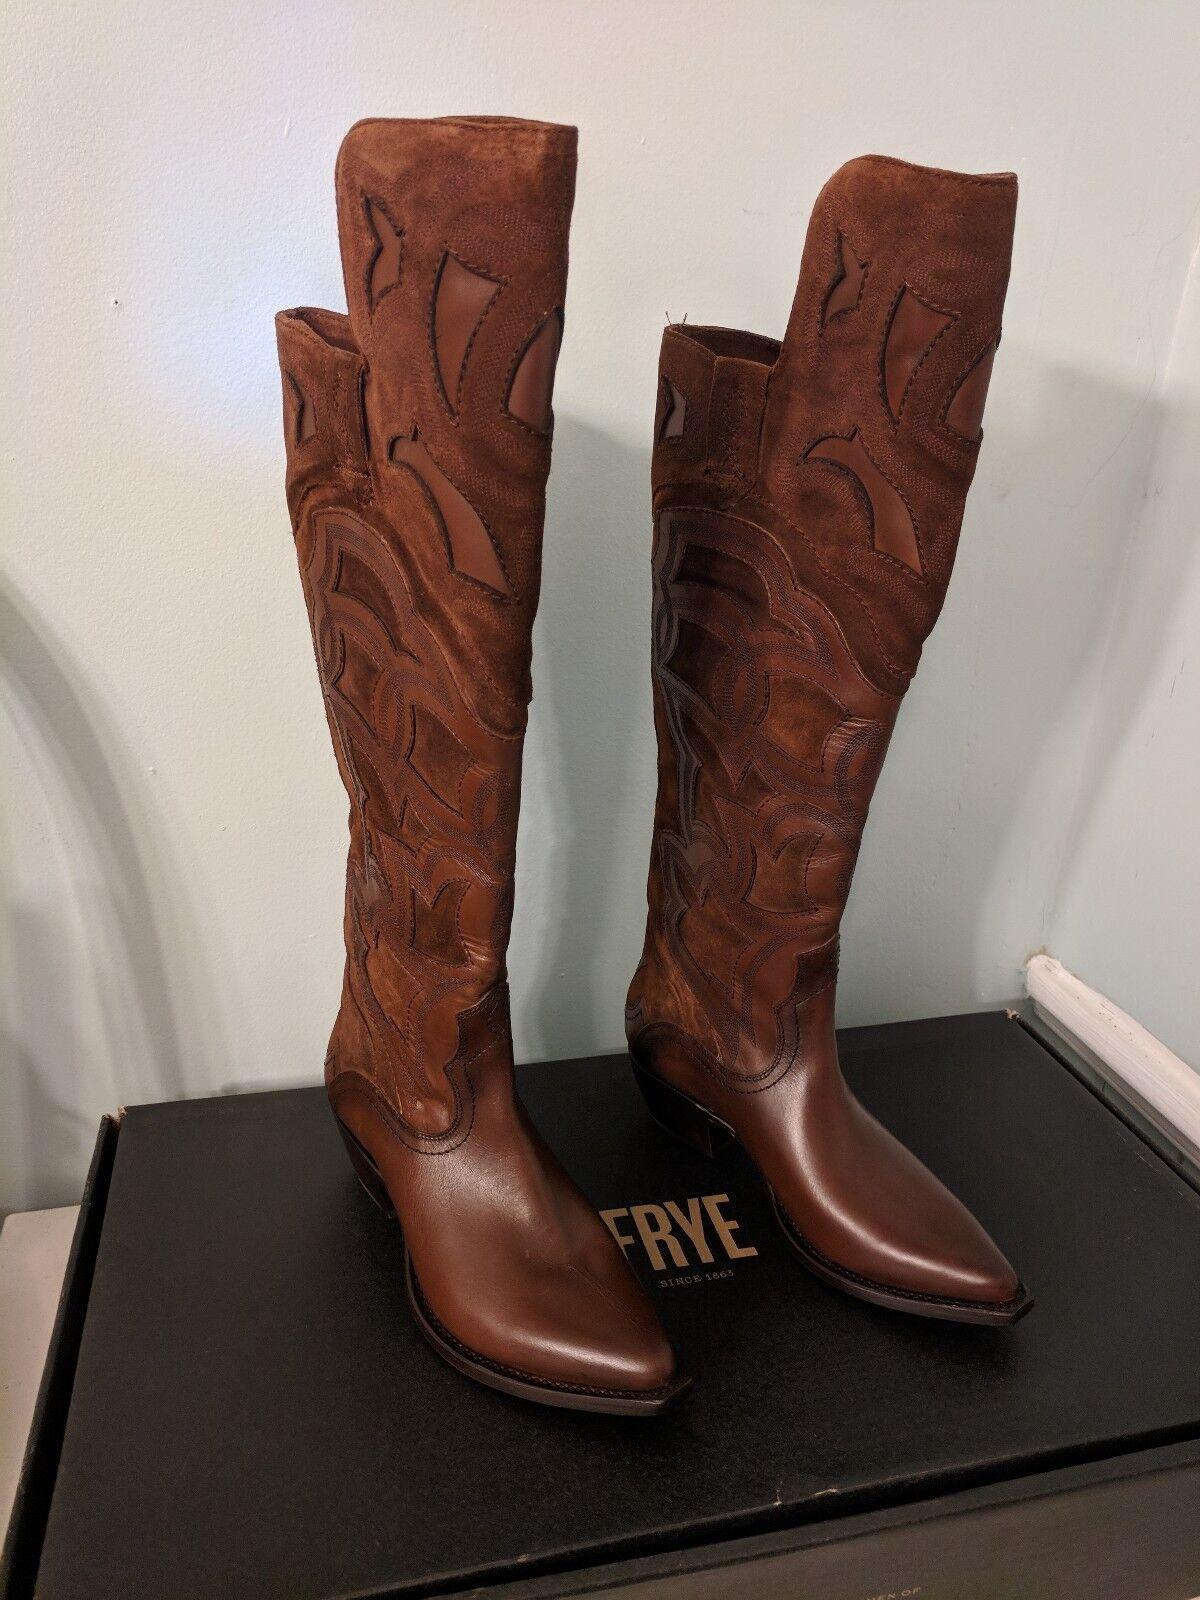 negozio outlet     FRYE Donna  Shane Embroidered Cuff Western avvio WISKEY Marrone OTK 7.5 M SEXY    punto vendita